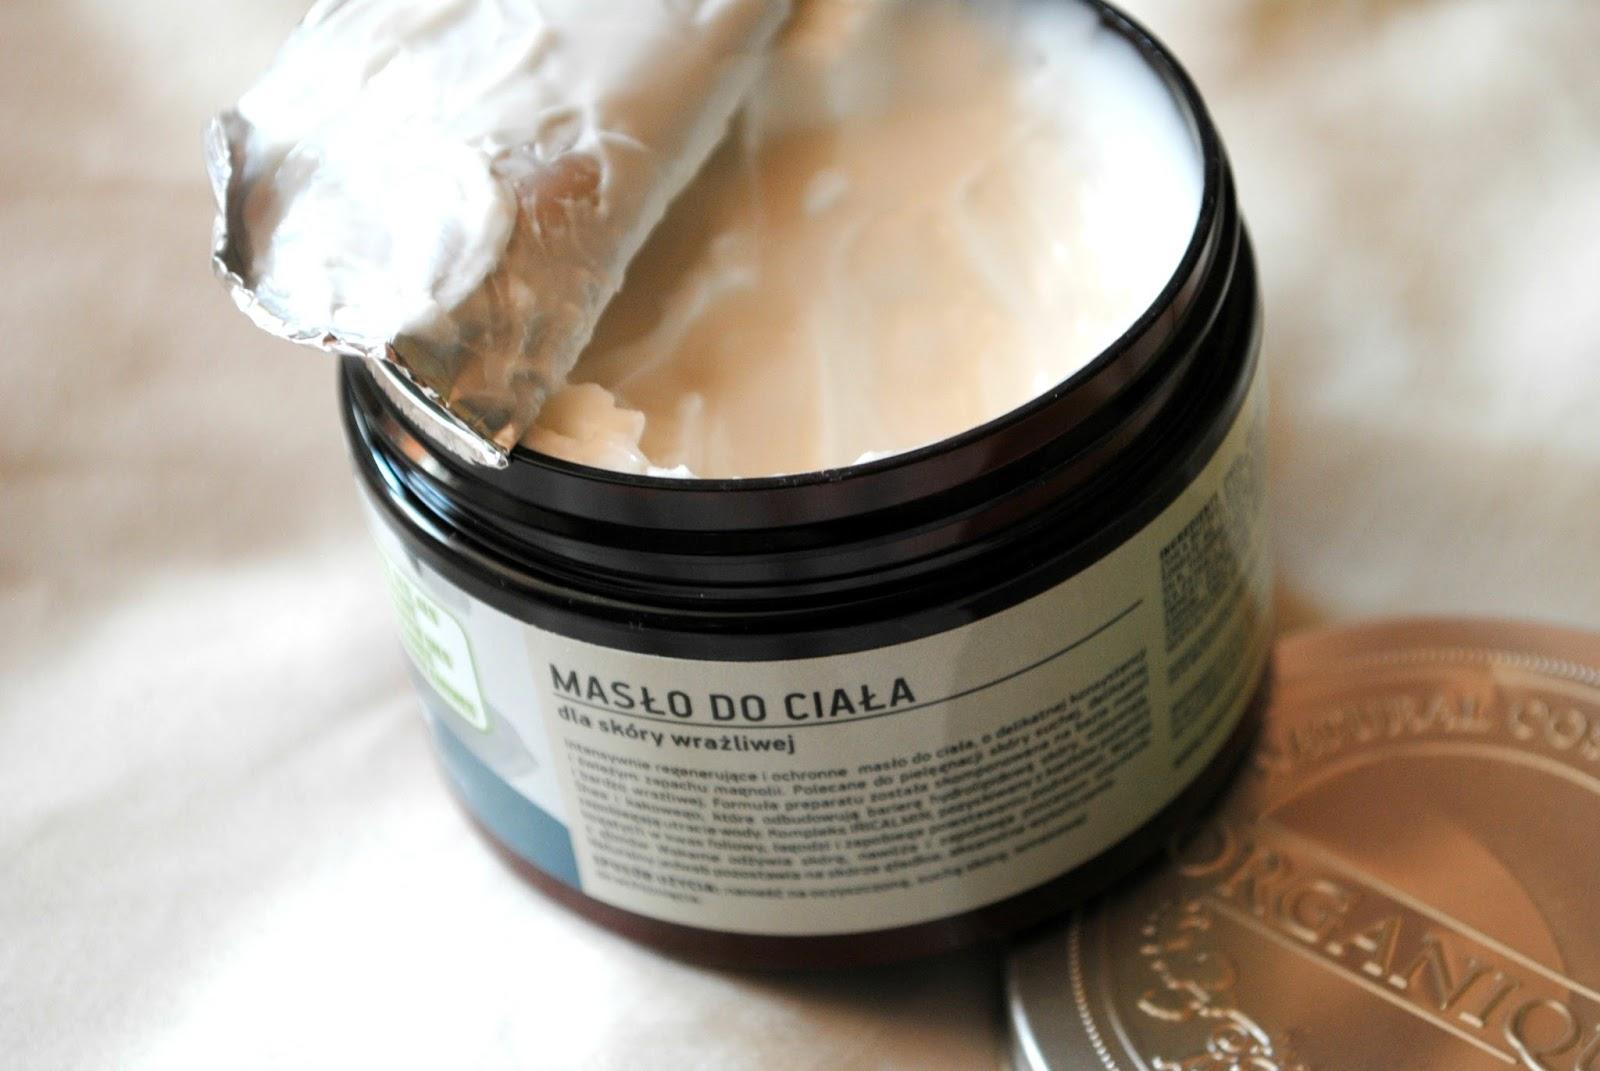 Masło do skóry wrażliwej Organique magnolia beautypediapatt